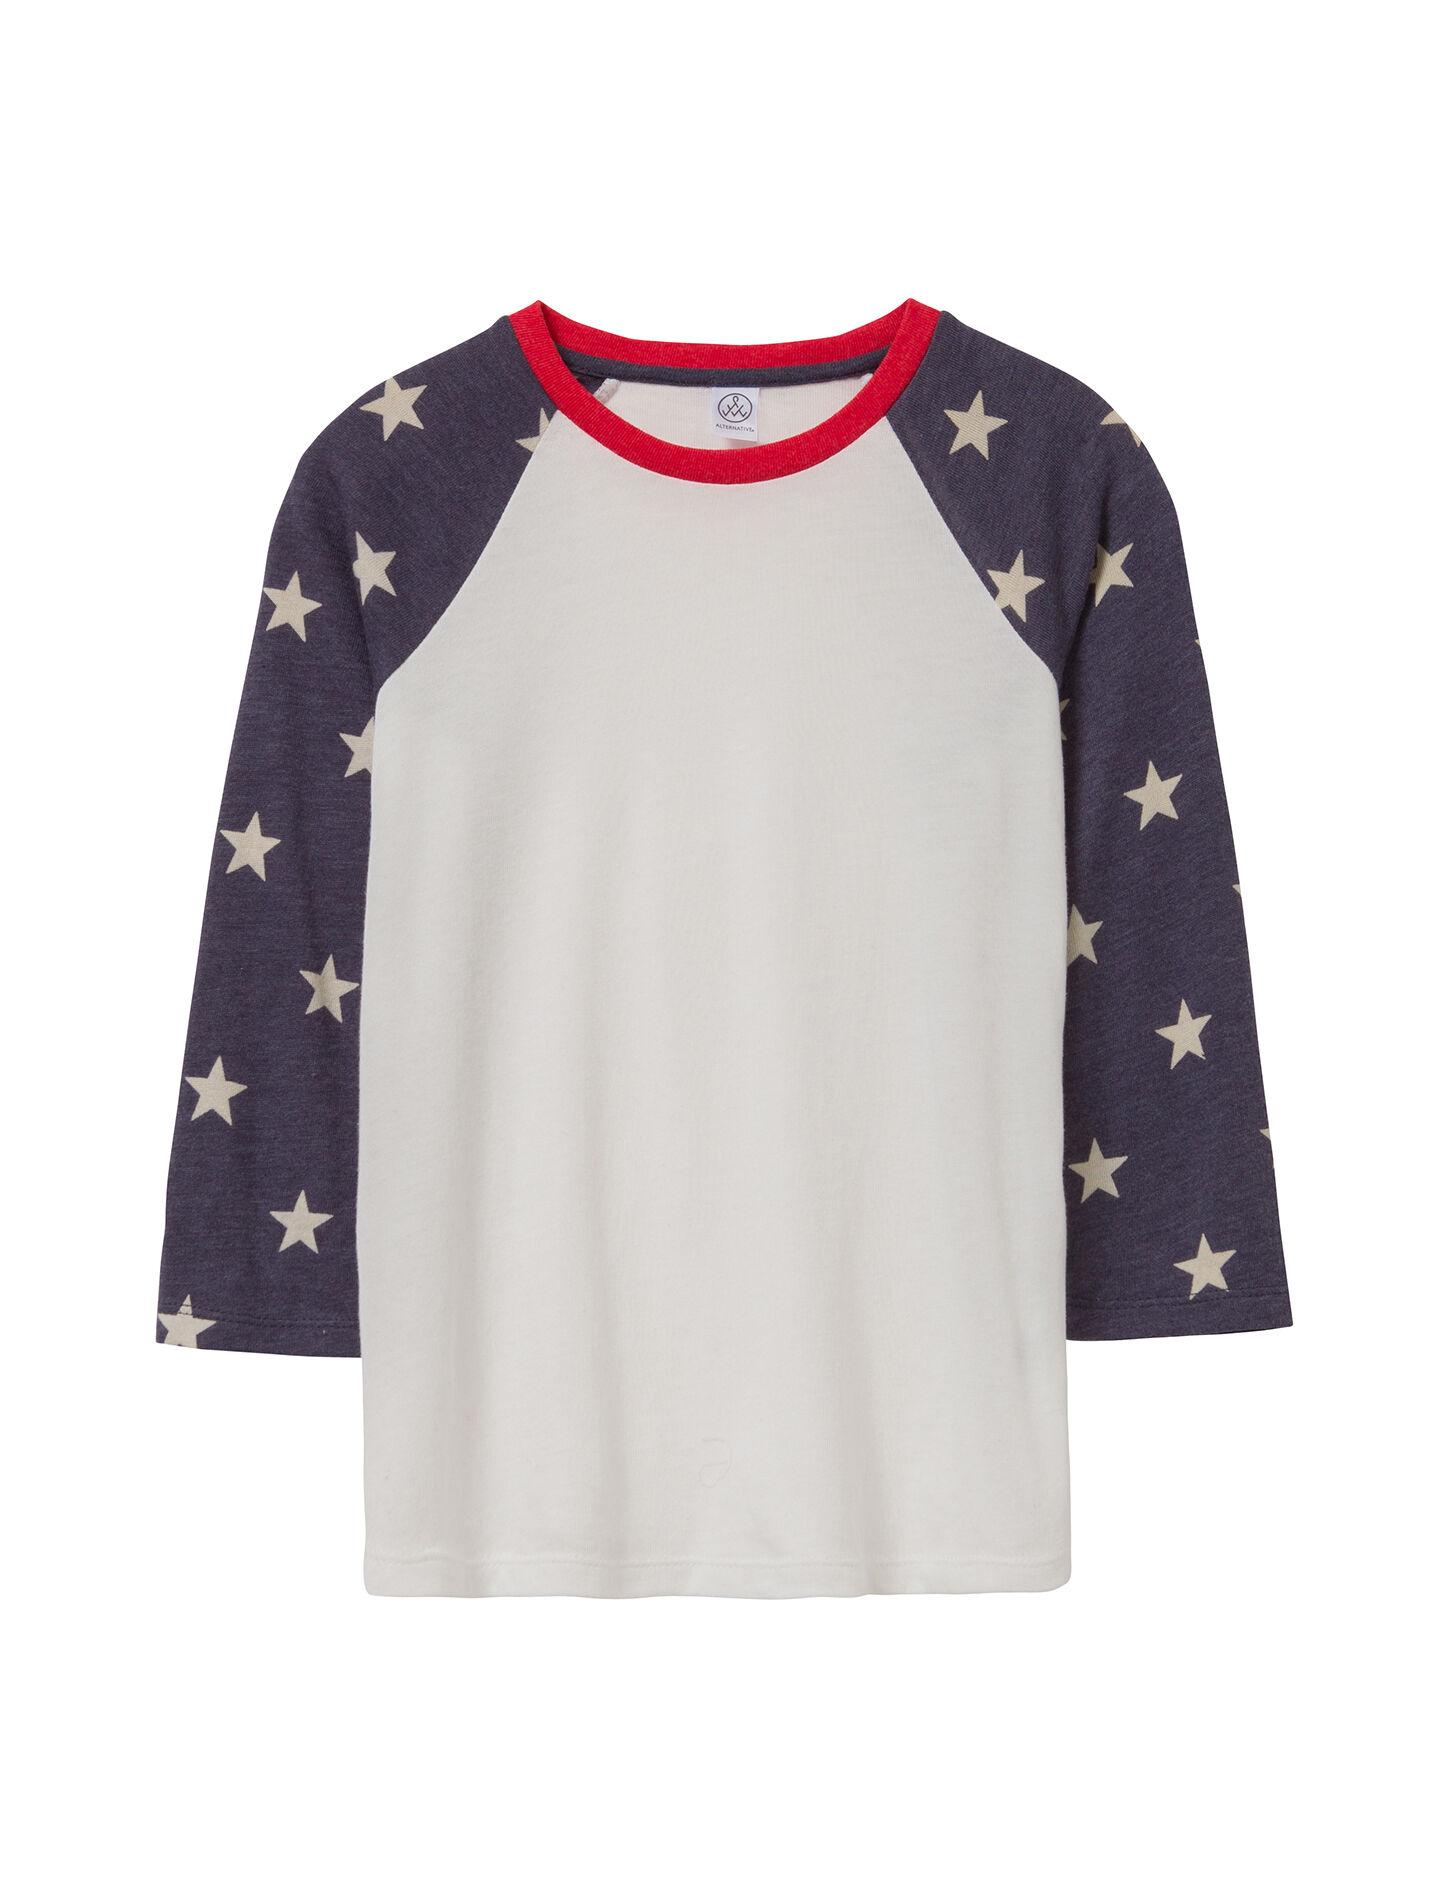 Alternative Apparel Baseball Printed Eco-Jersey Youth T-Shirt - Stars - Size: YM